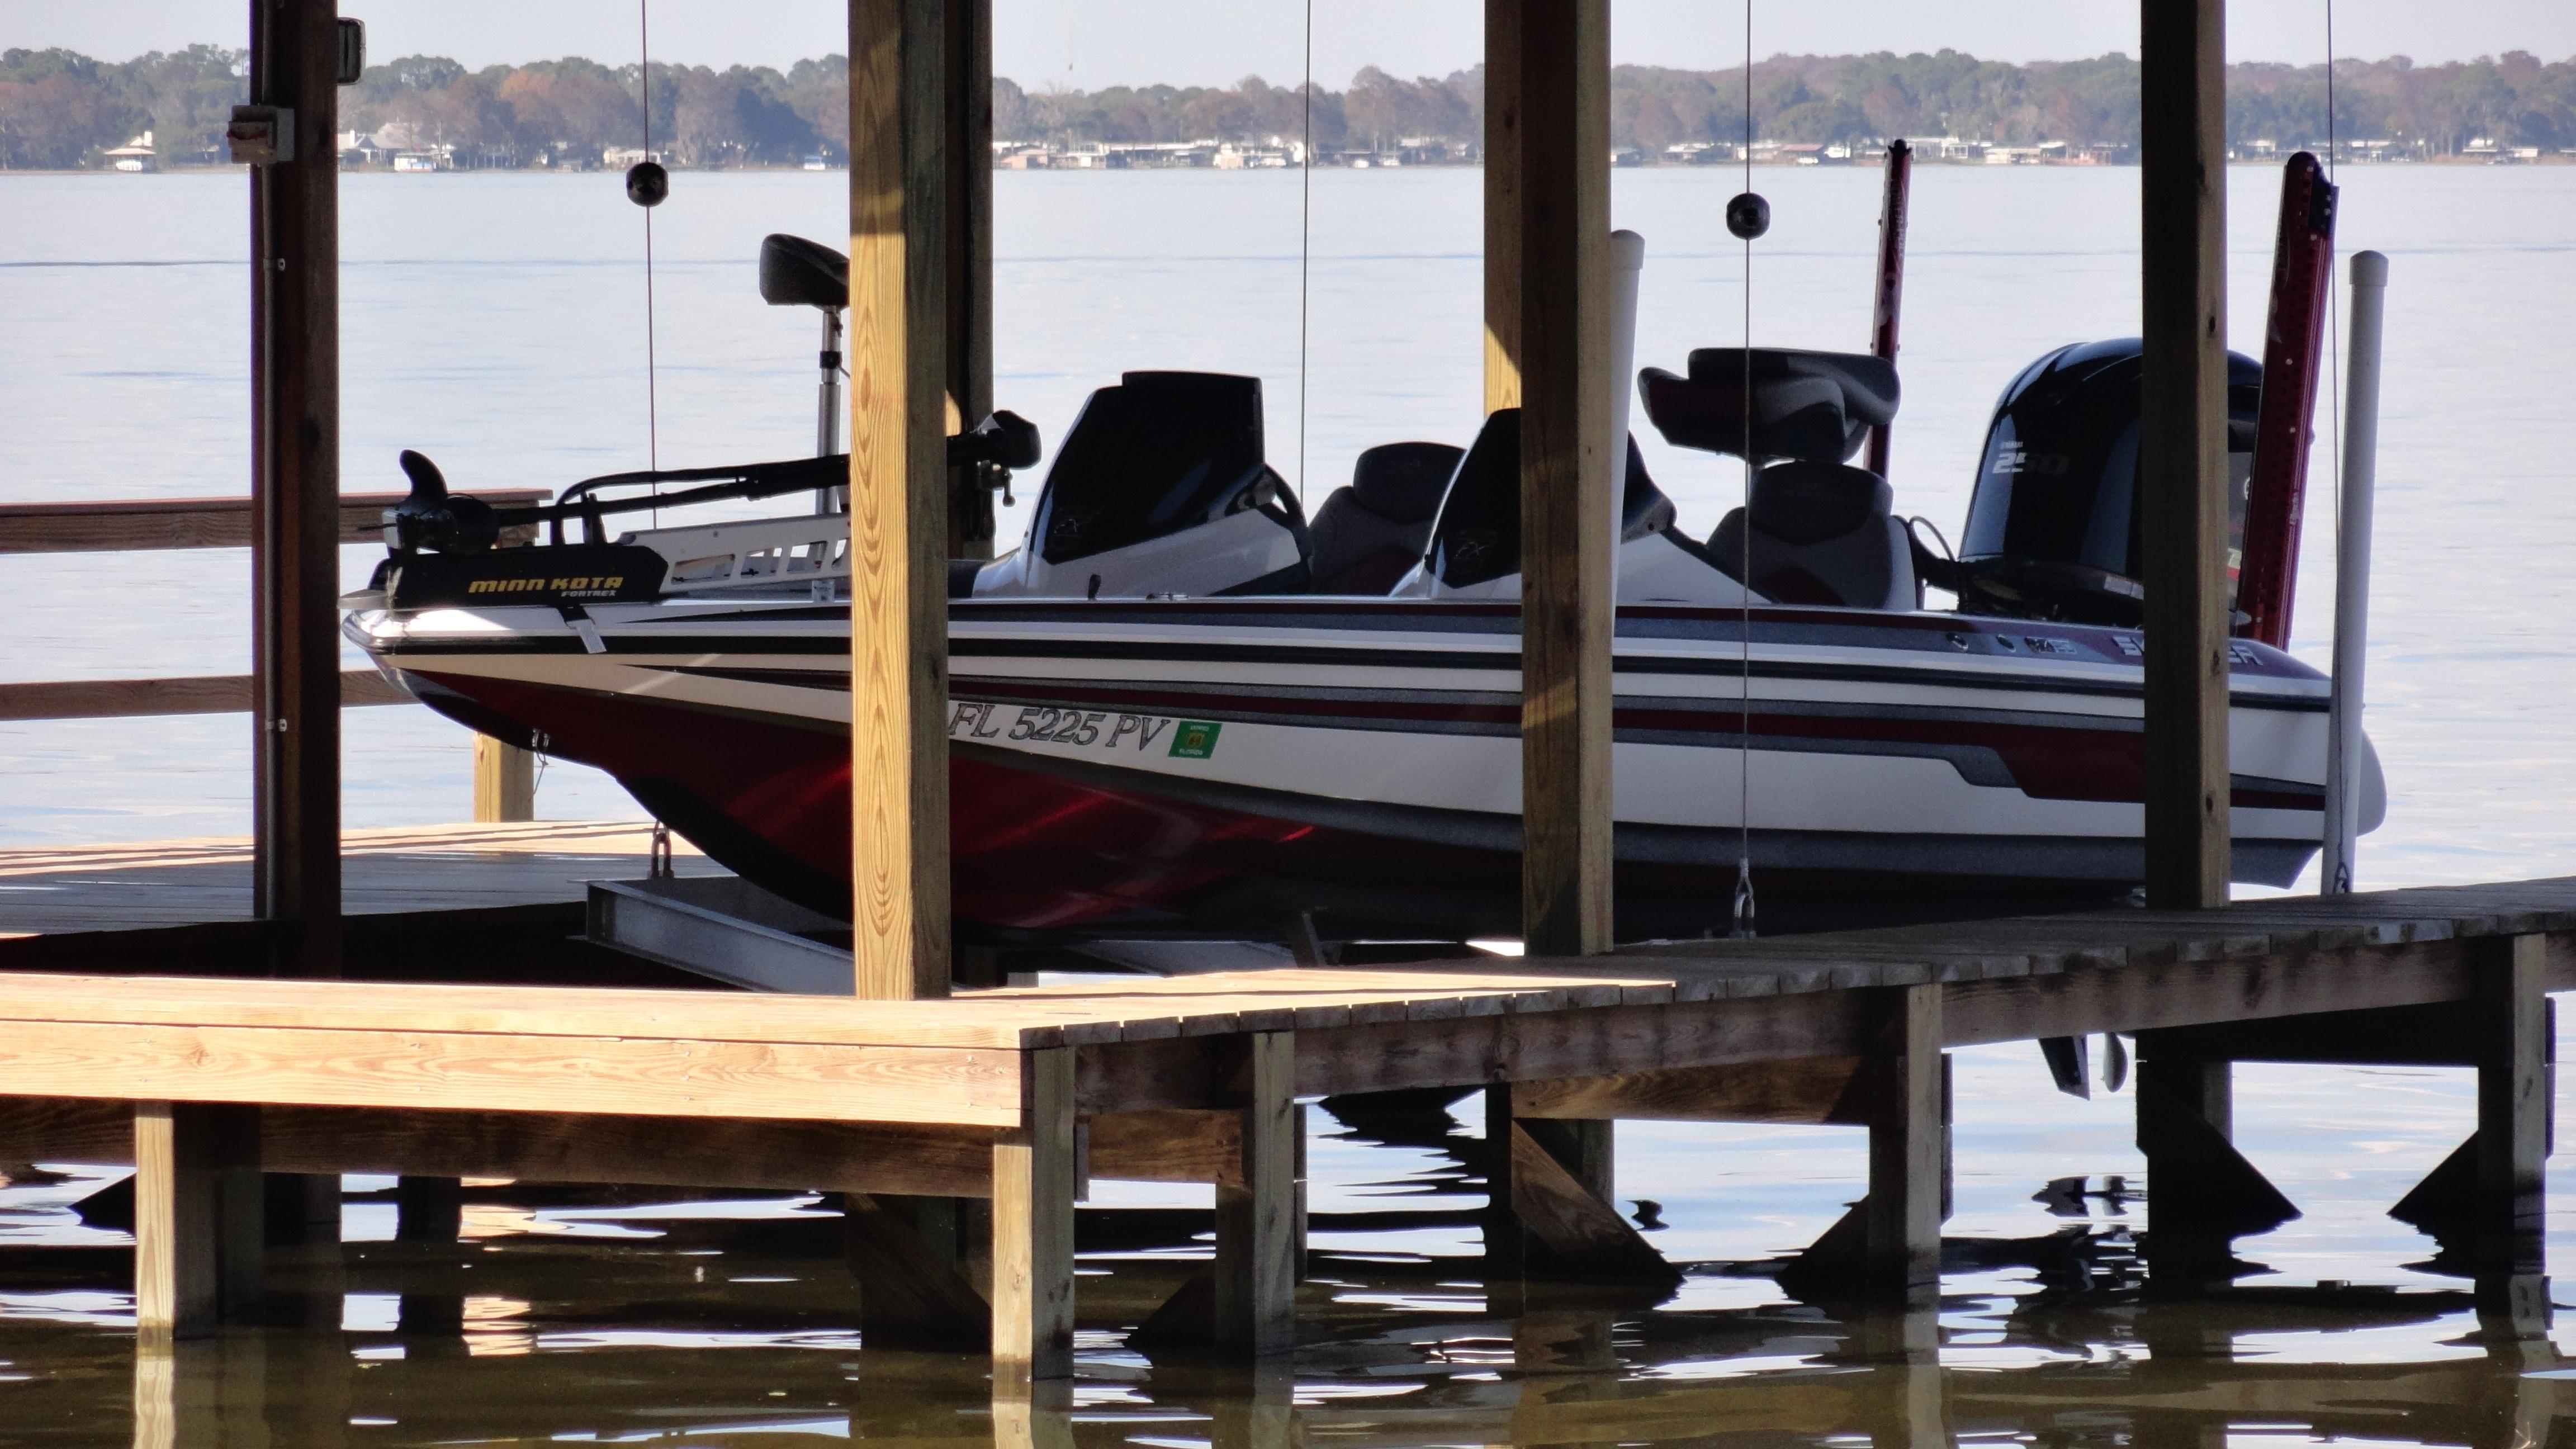 Water Dock Wood Boat Lake Pier Transportation Vehicle Mast Port Room Boating  Maritime Watercraft Boat Dock